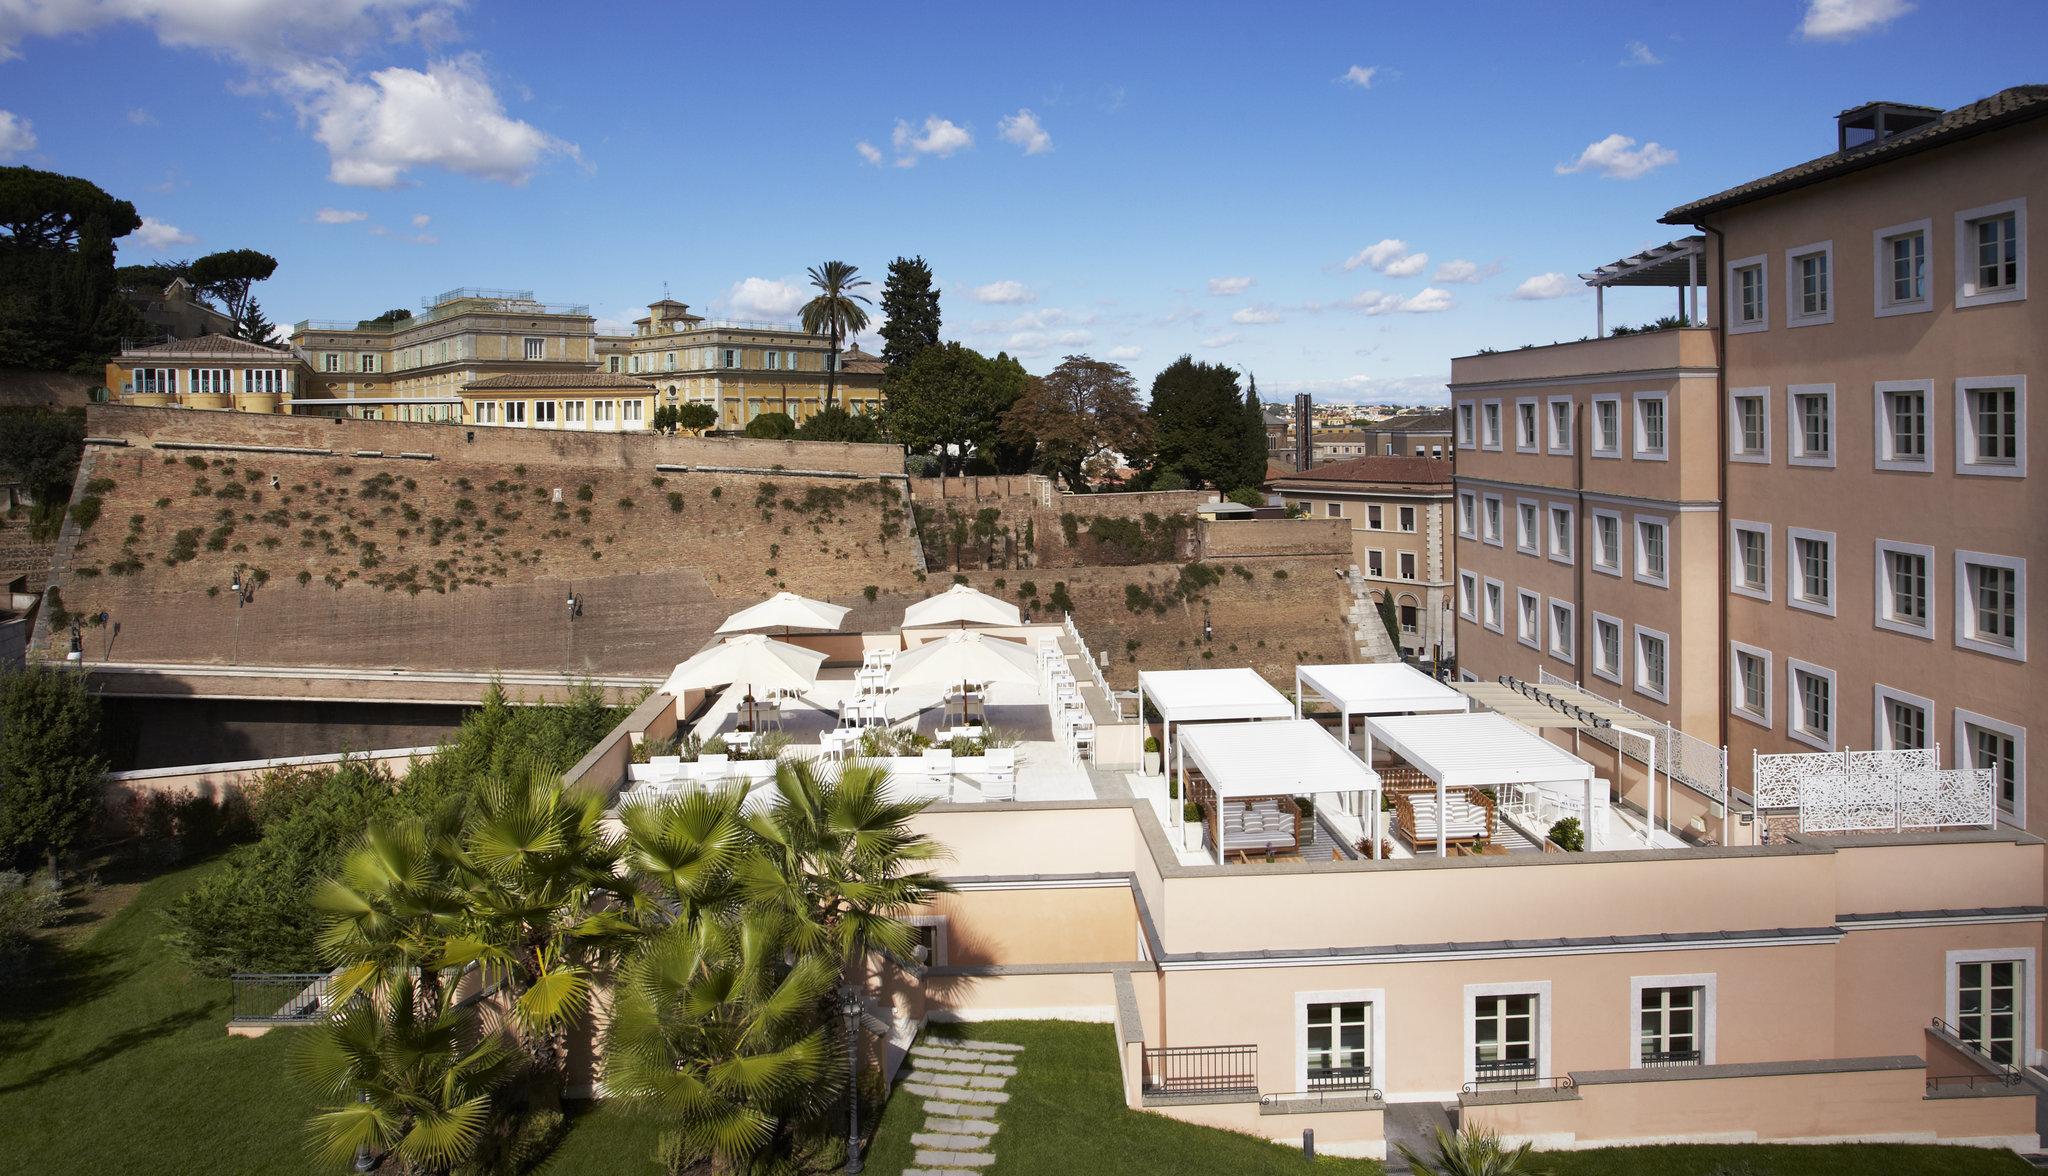 Gran melia rome rome rockstar hotels for Rome gran melia hotel